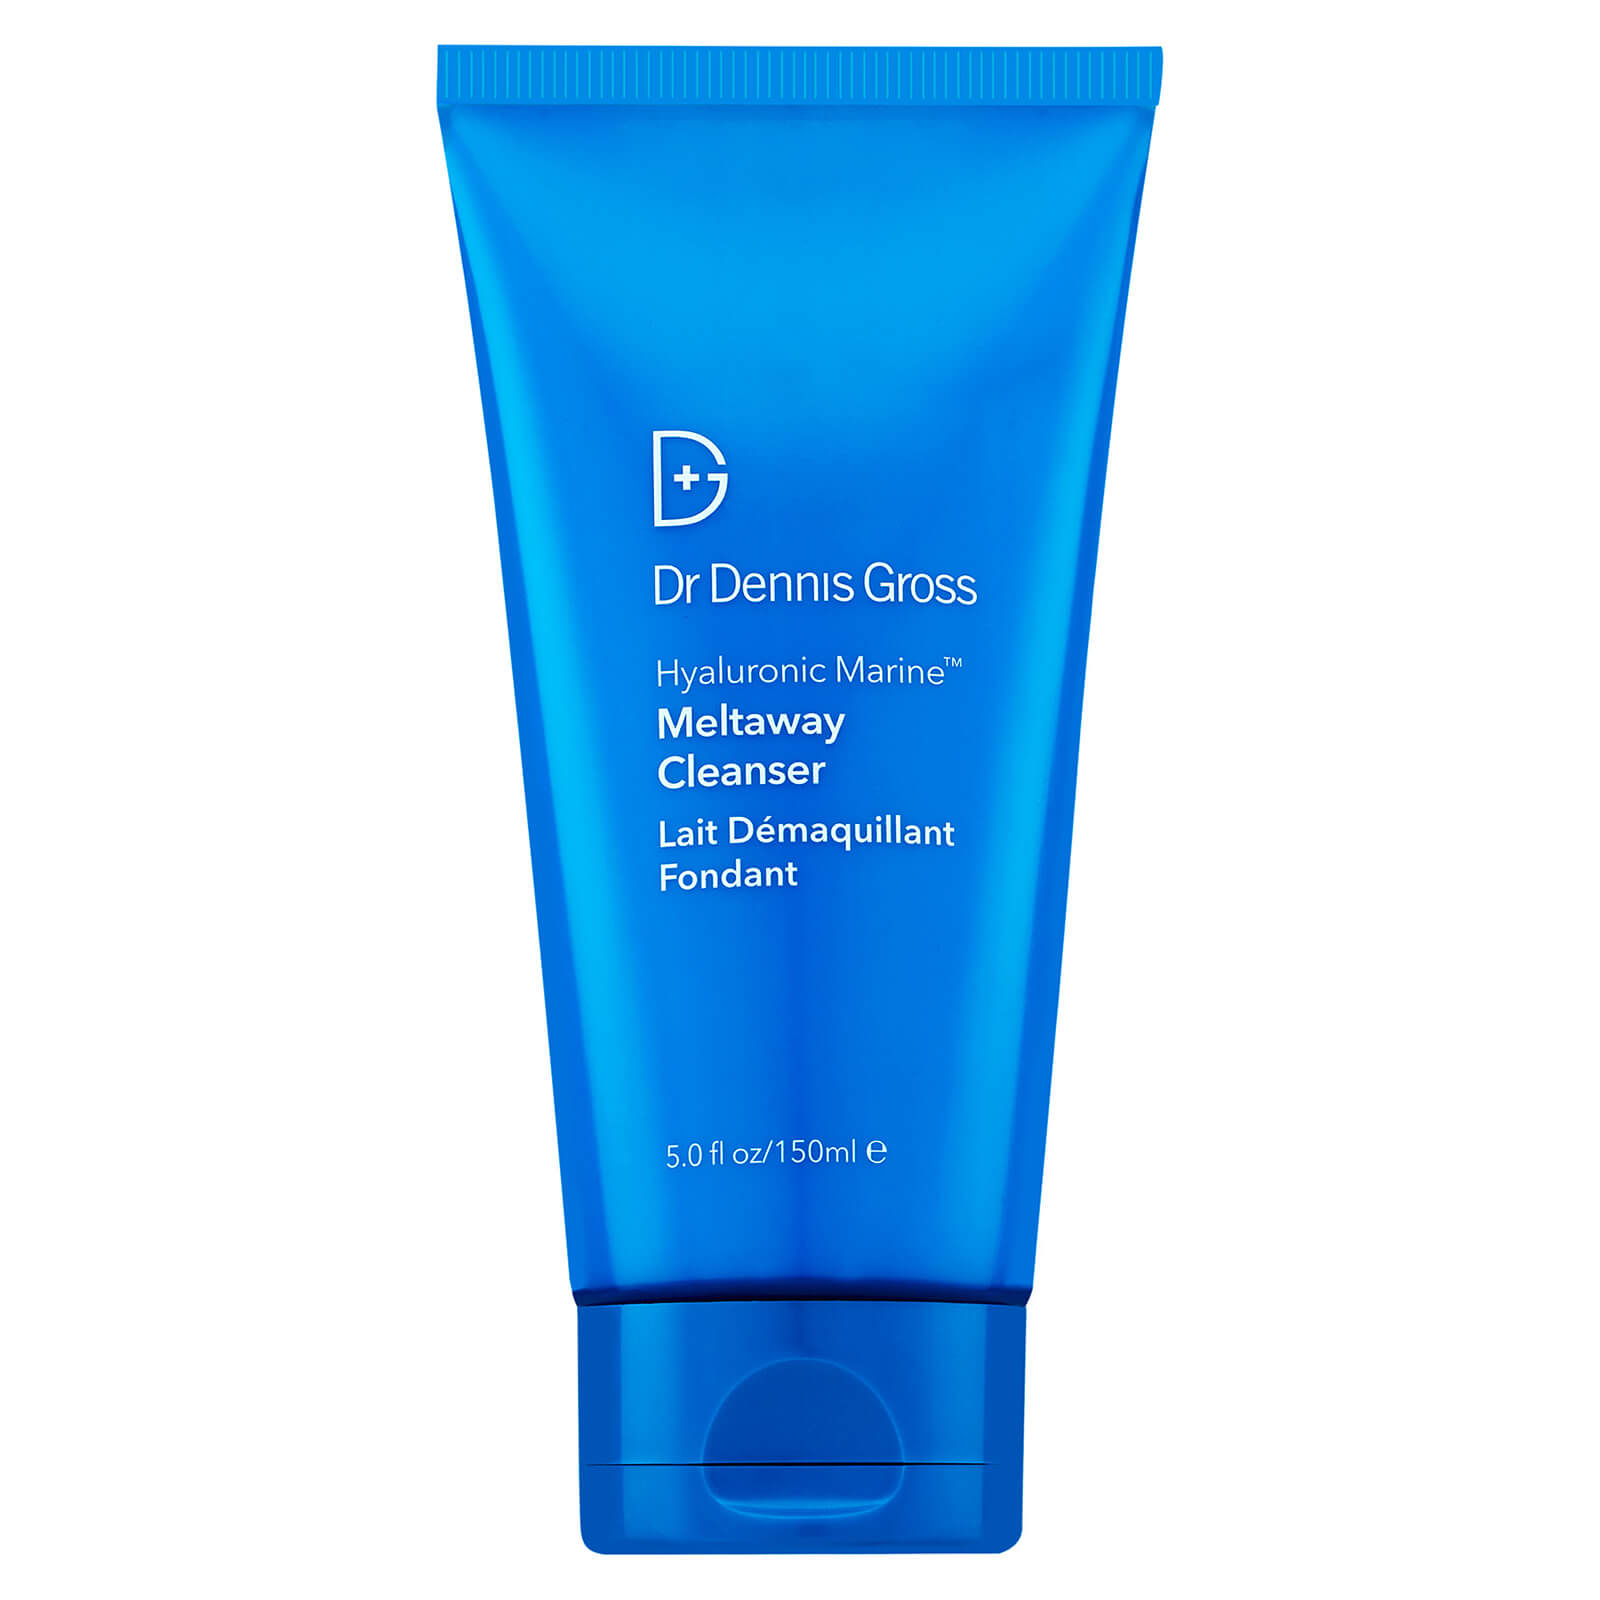 Купить Dr Dennis Gross Skincare Hyaluronic Marine Meltaway Cleanser 150ml